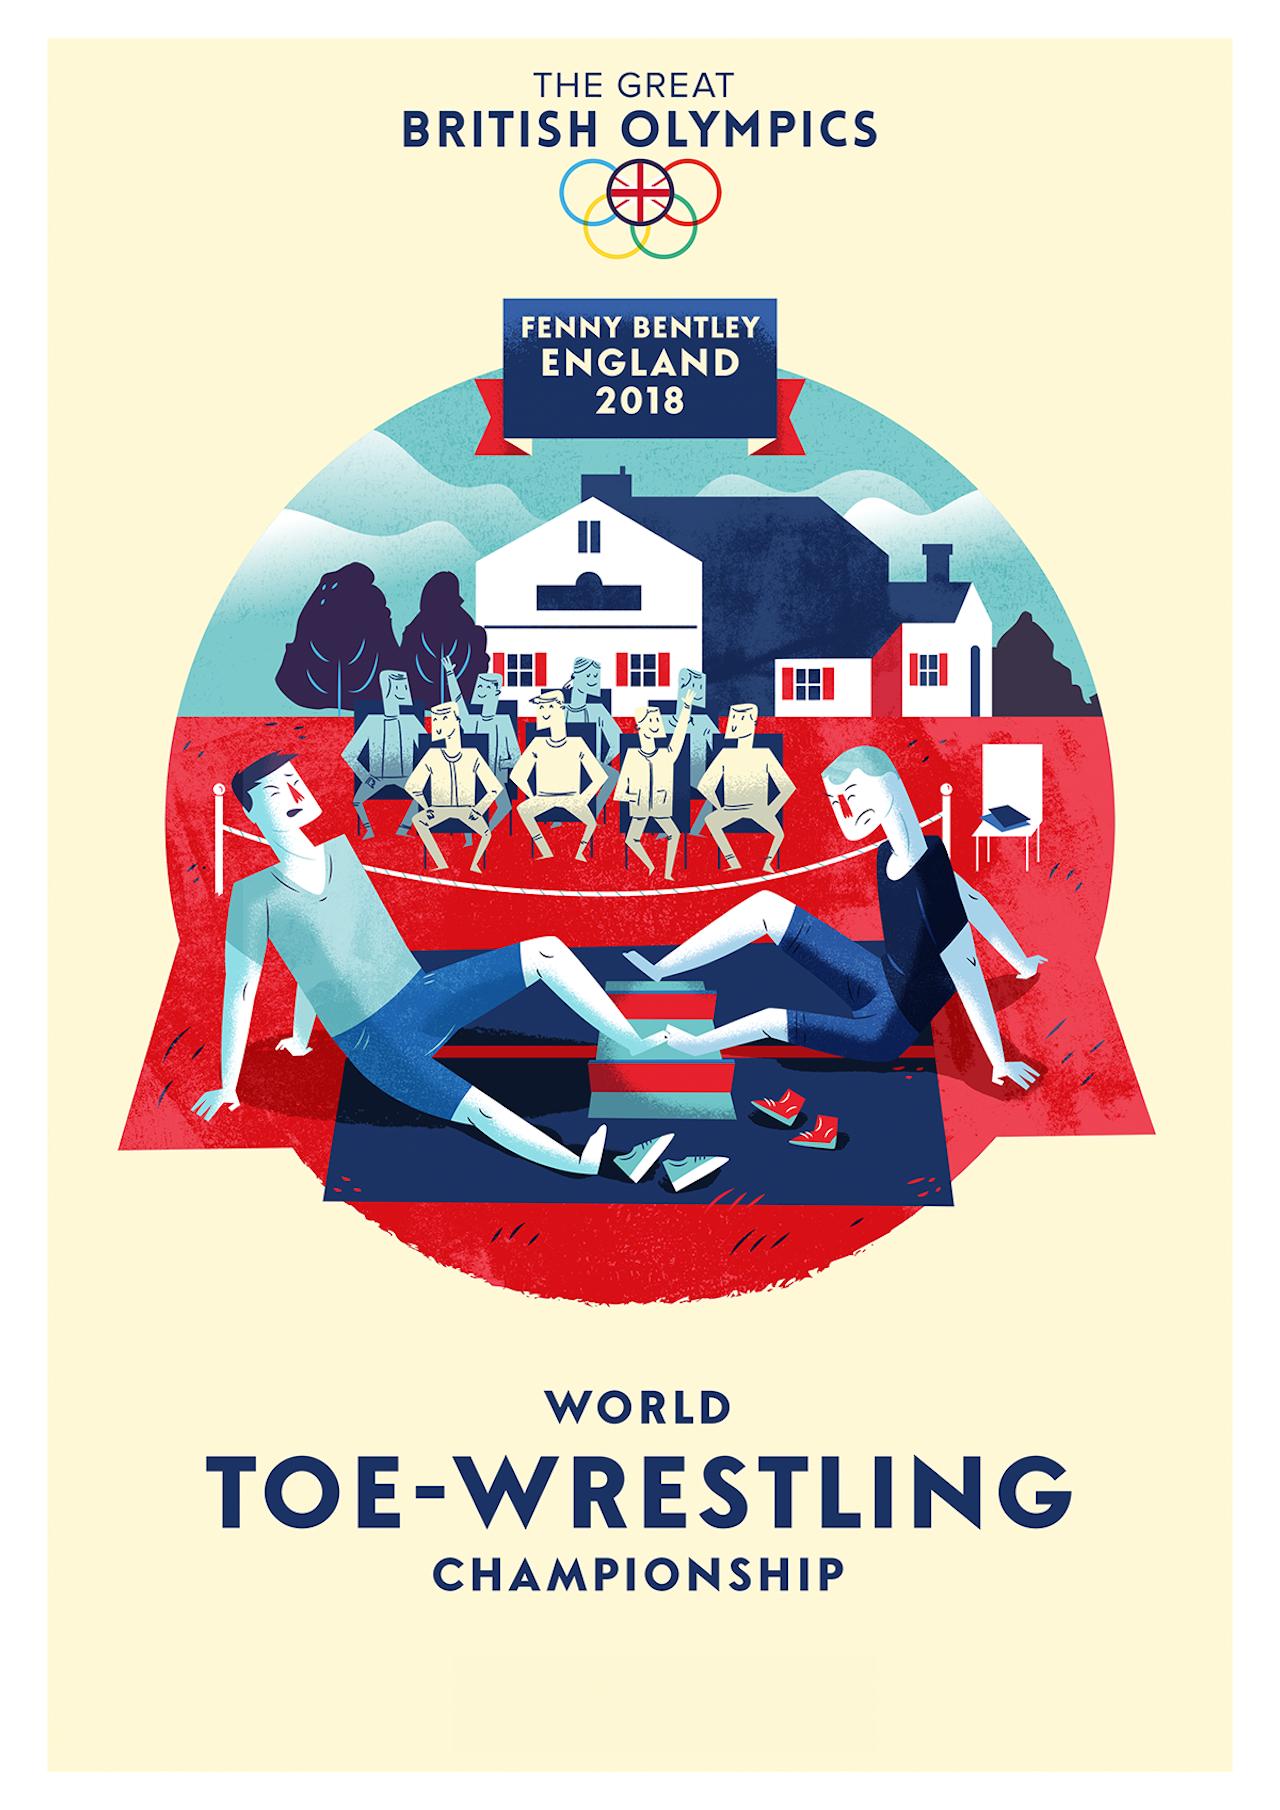 British Olympics_11 Toe Wrestling